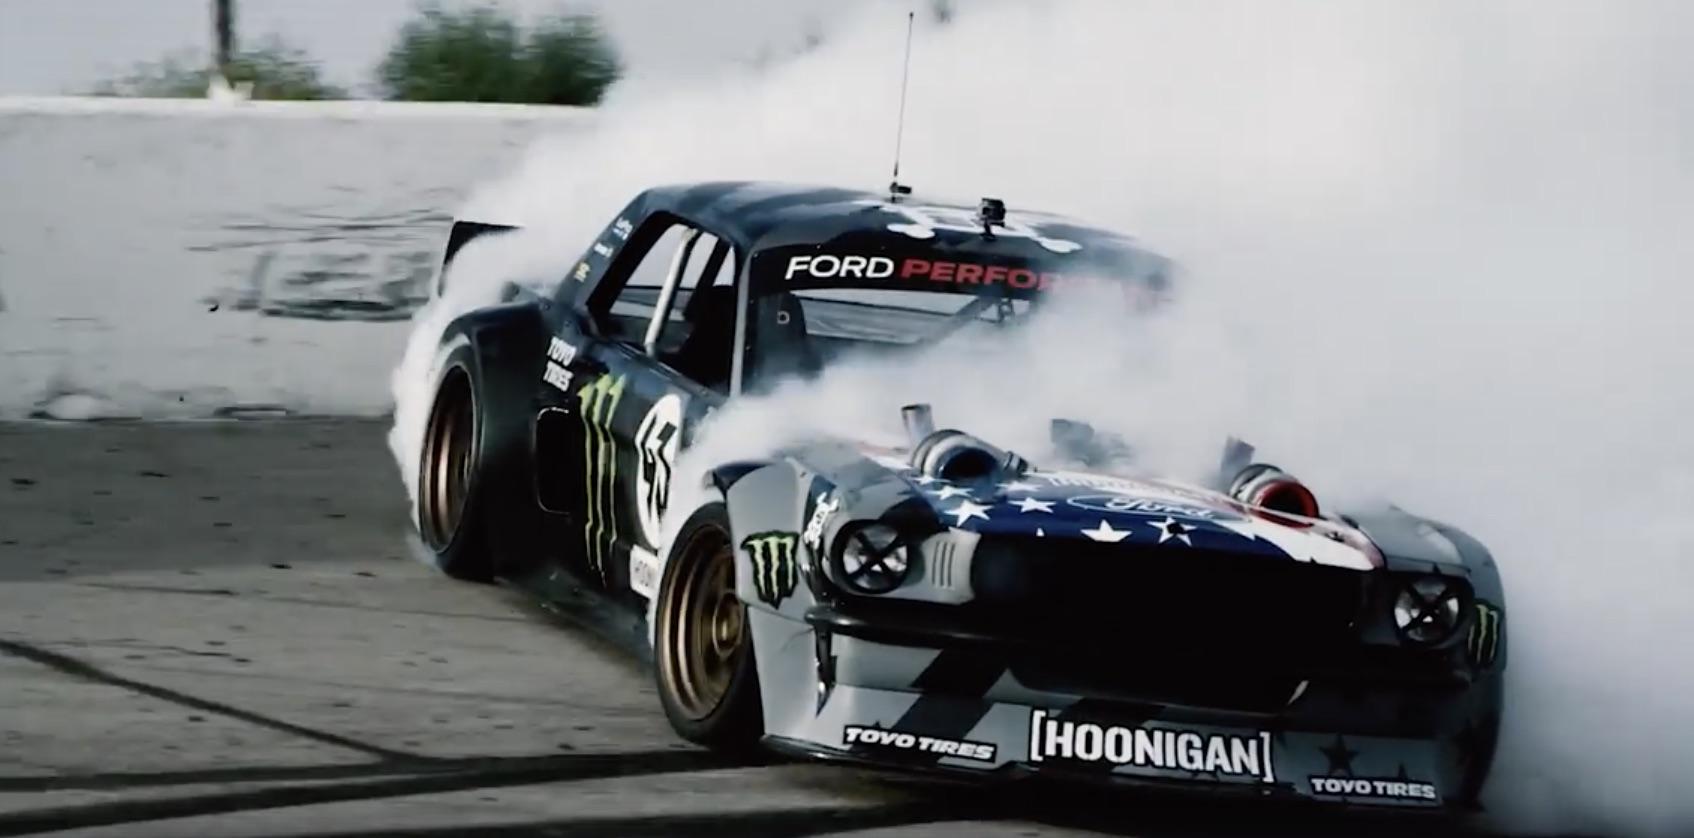 Ken Block says twin-turbo 1,400-hp Hoonicorn is frightening